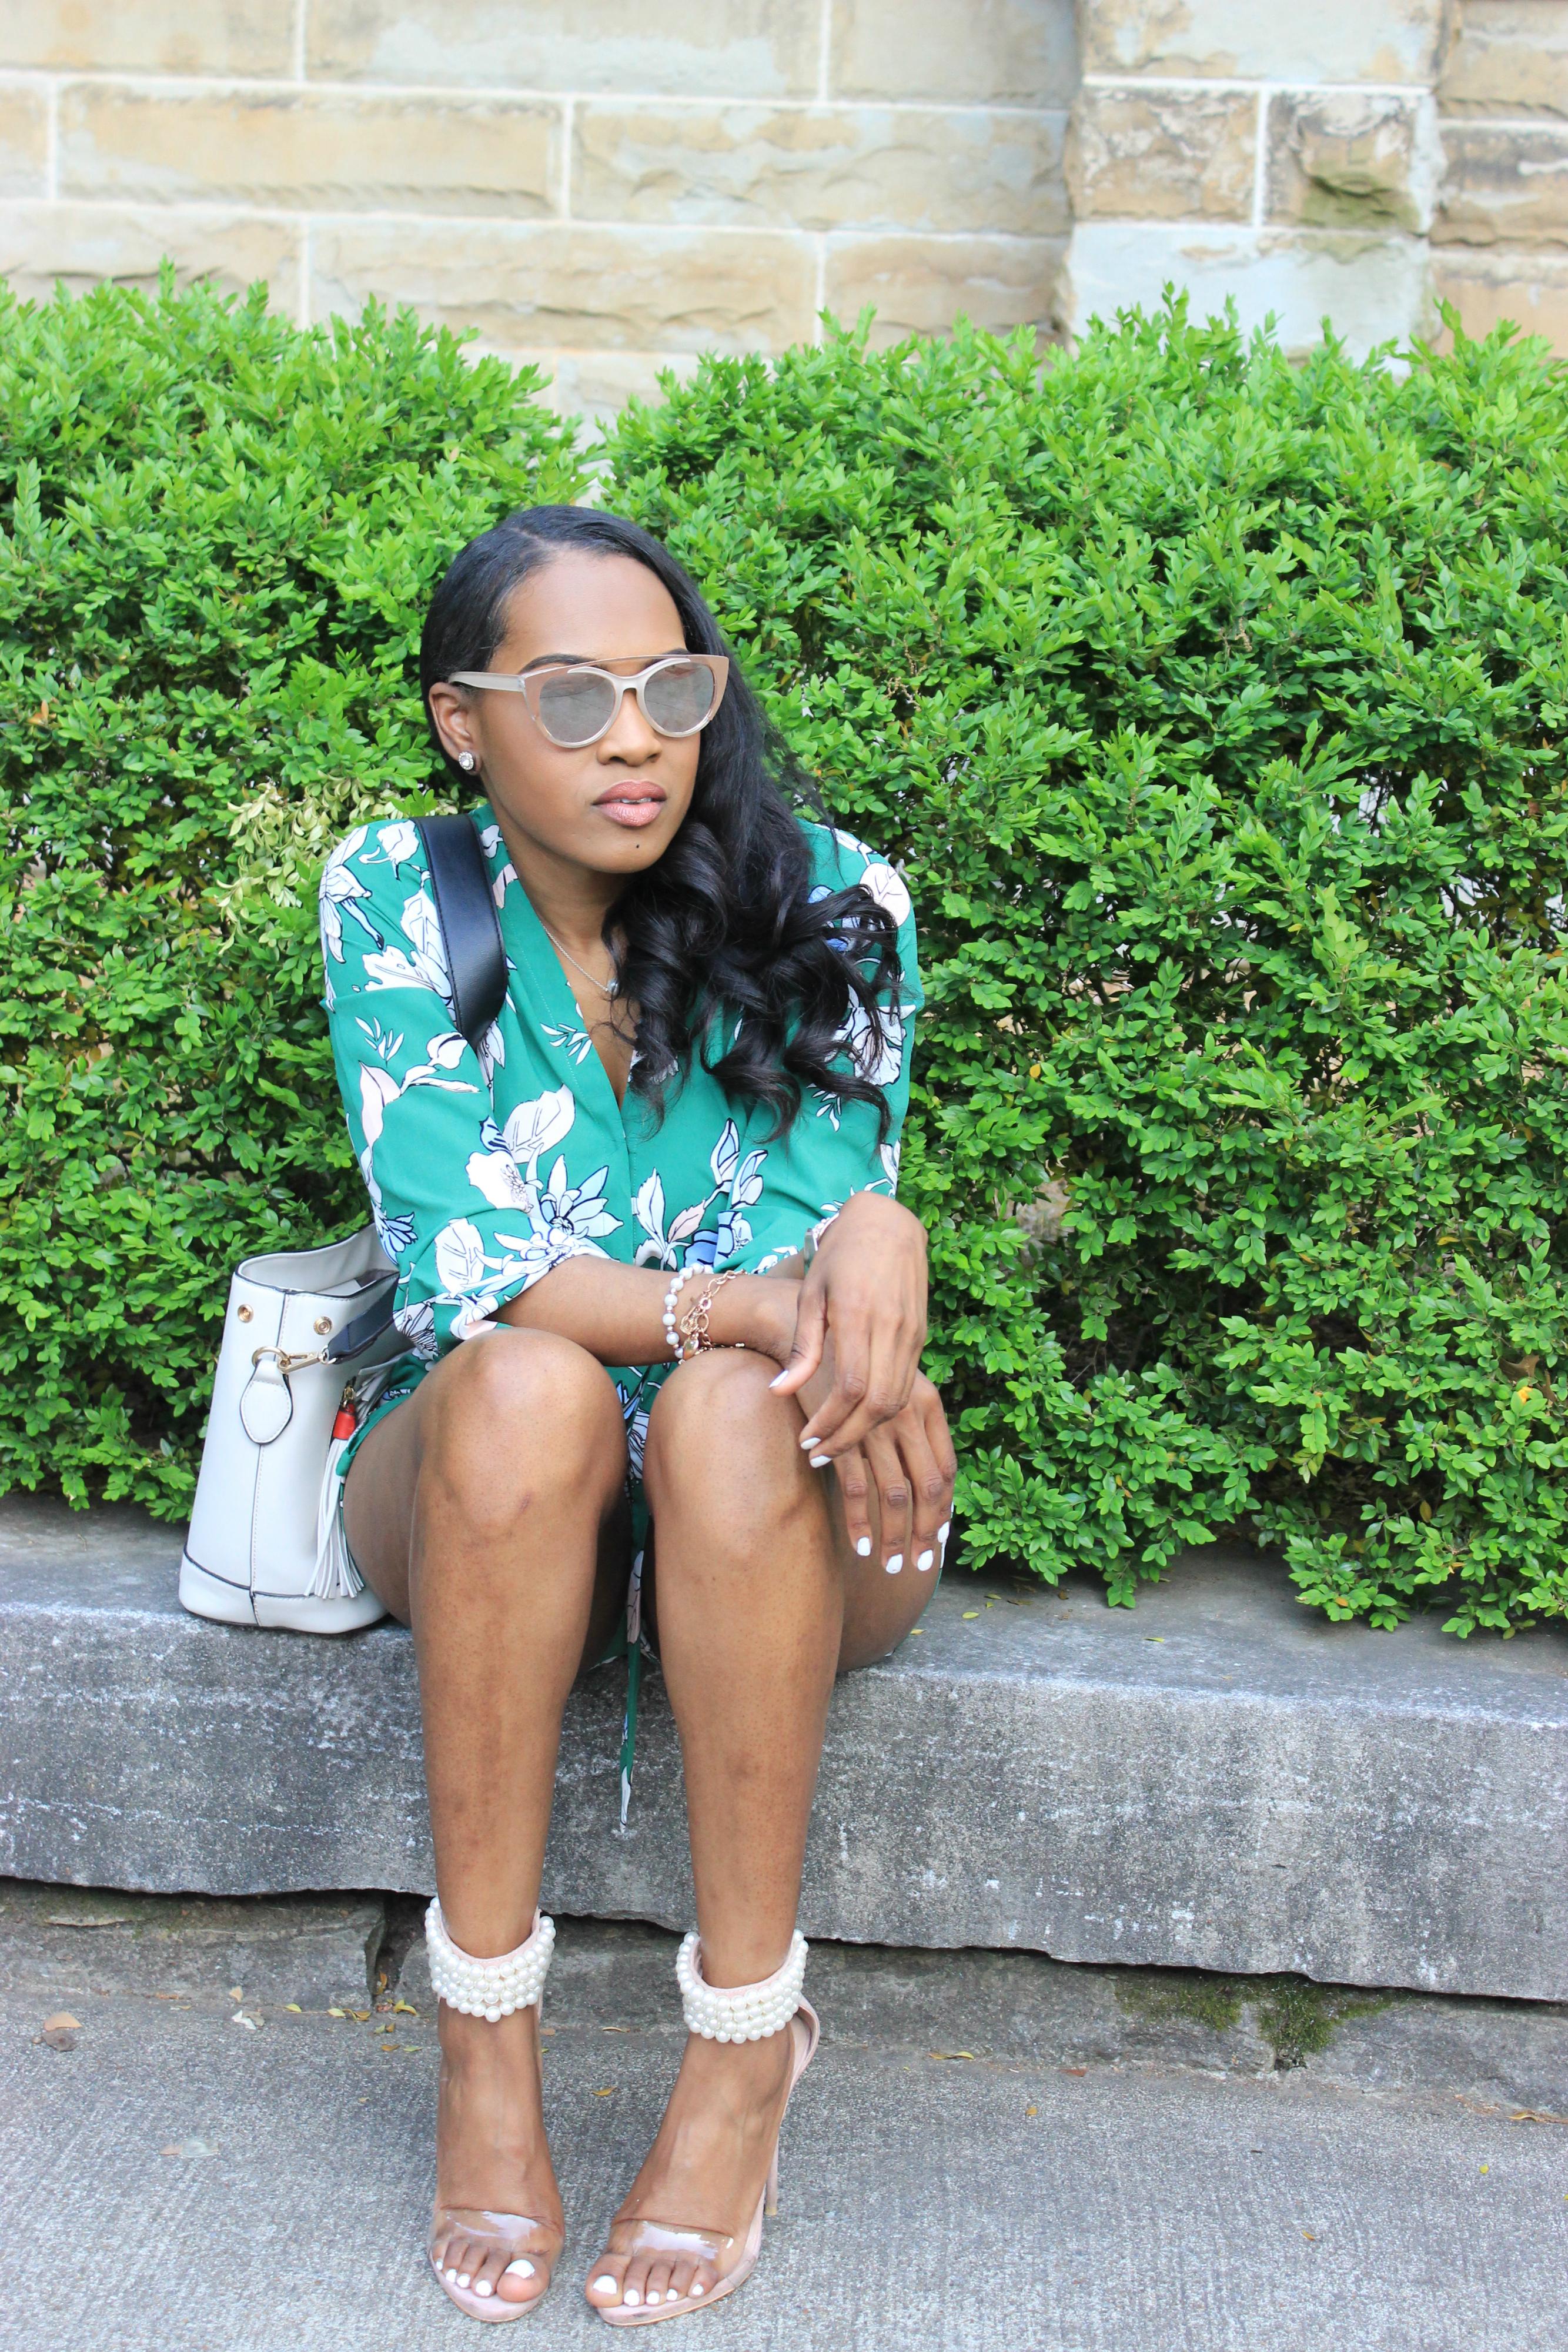 Carolina-belle-green-floral-romper-missguided-pearl-strap-sandals-top-birmingham-blogger-oohlalablog-4